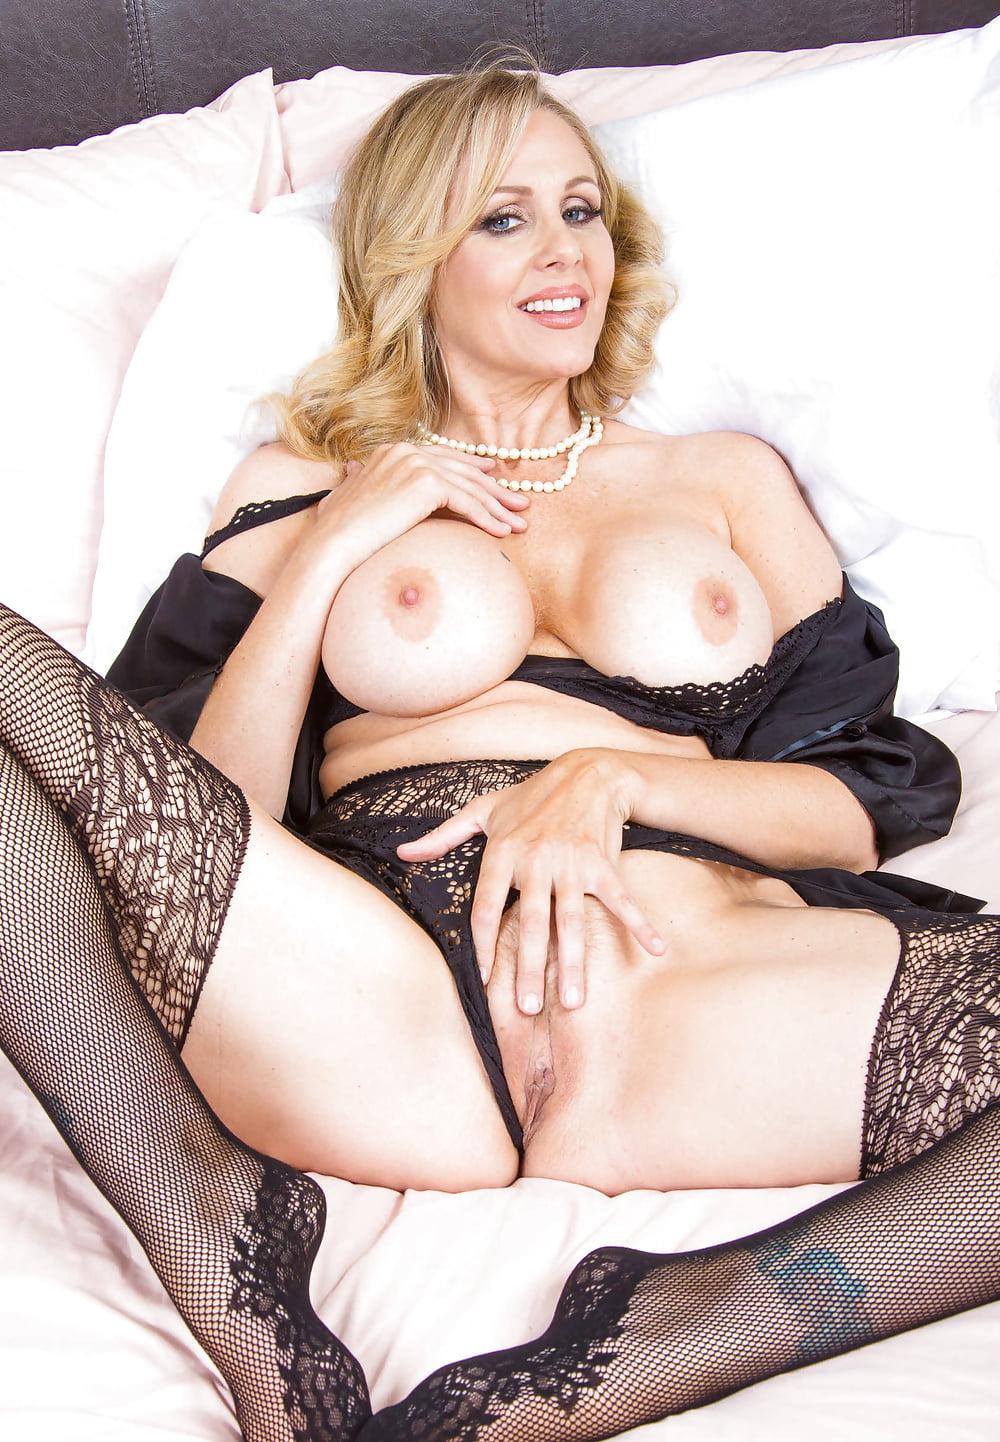 Порно зрелая опытная порно звезда джулия энн — pic 15